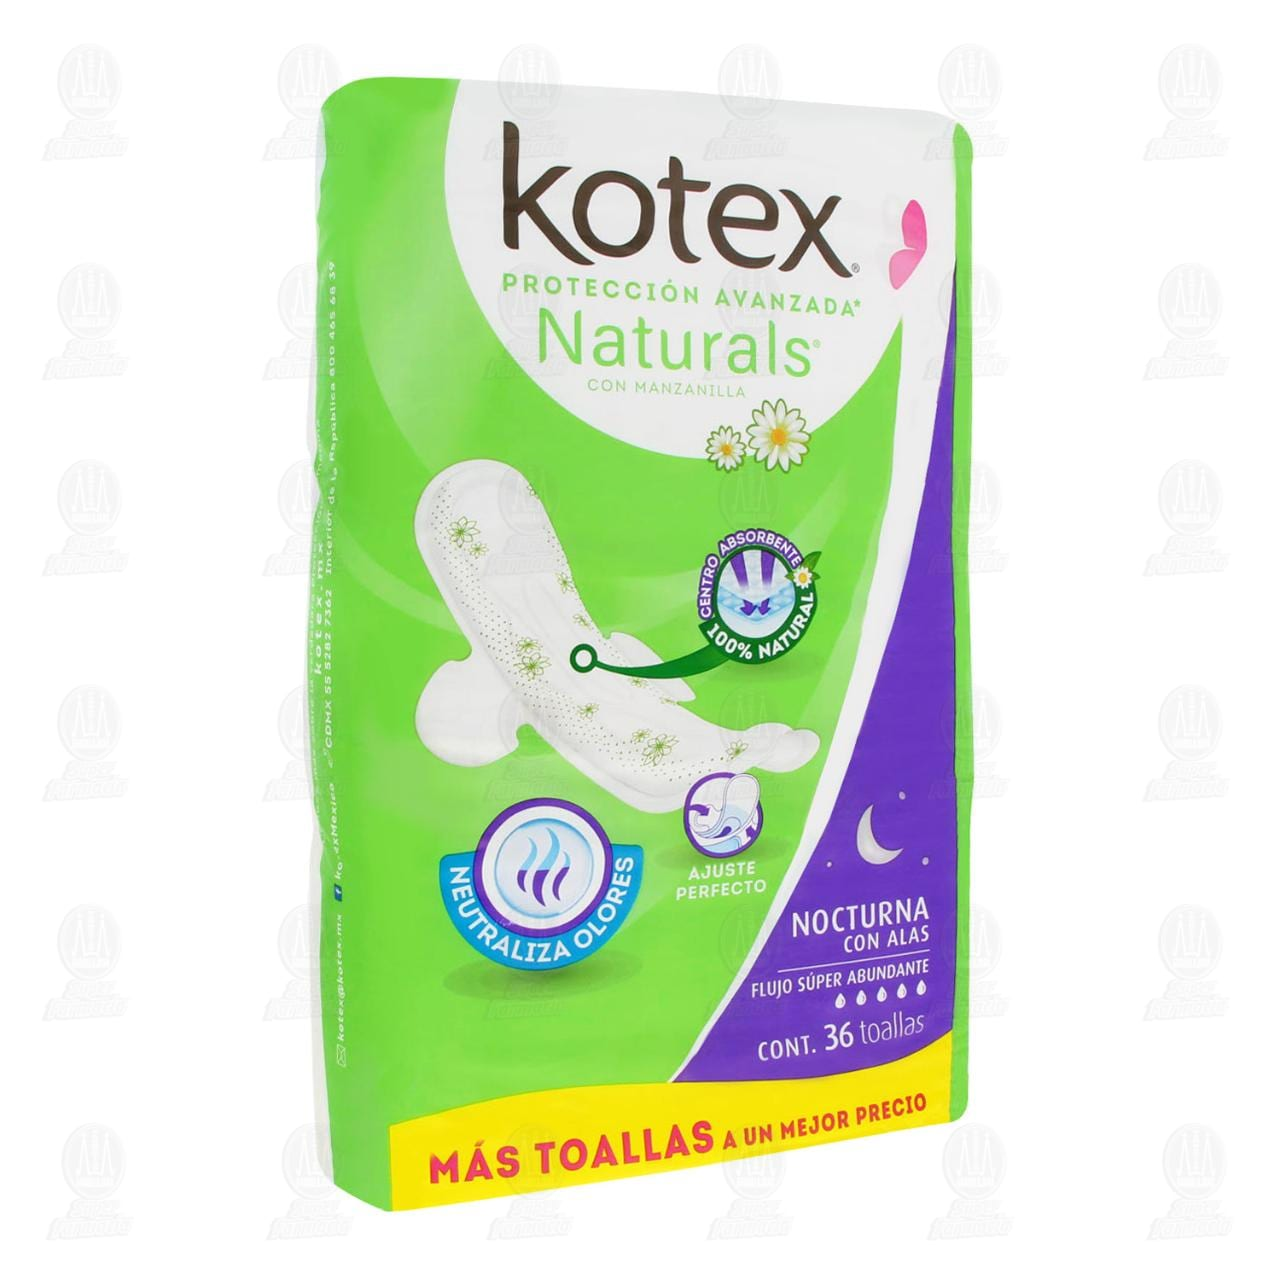 Comprar Toalla Femenina Kotex Naturals Nocturna con Alas, 36 pzas. en Farmacias Guadalajara